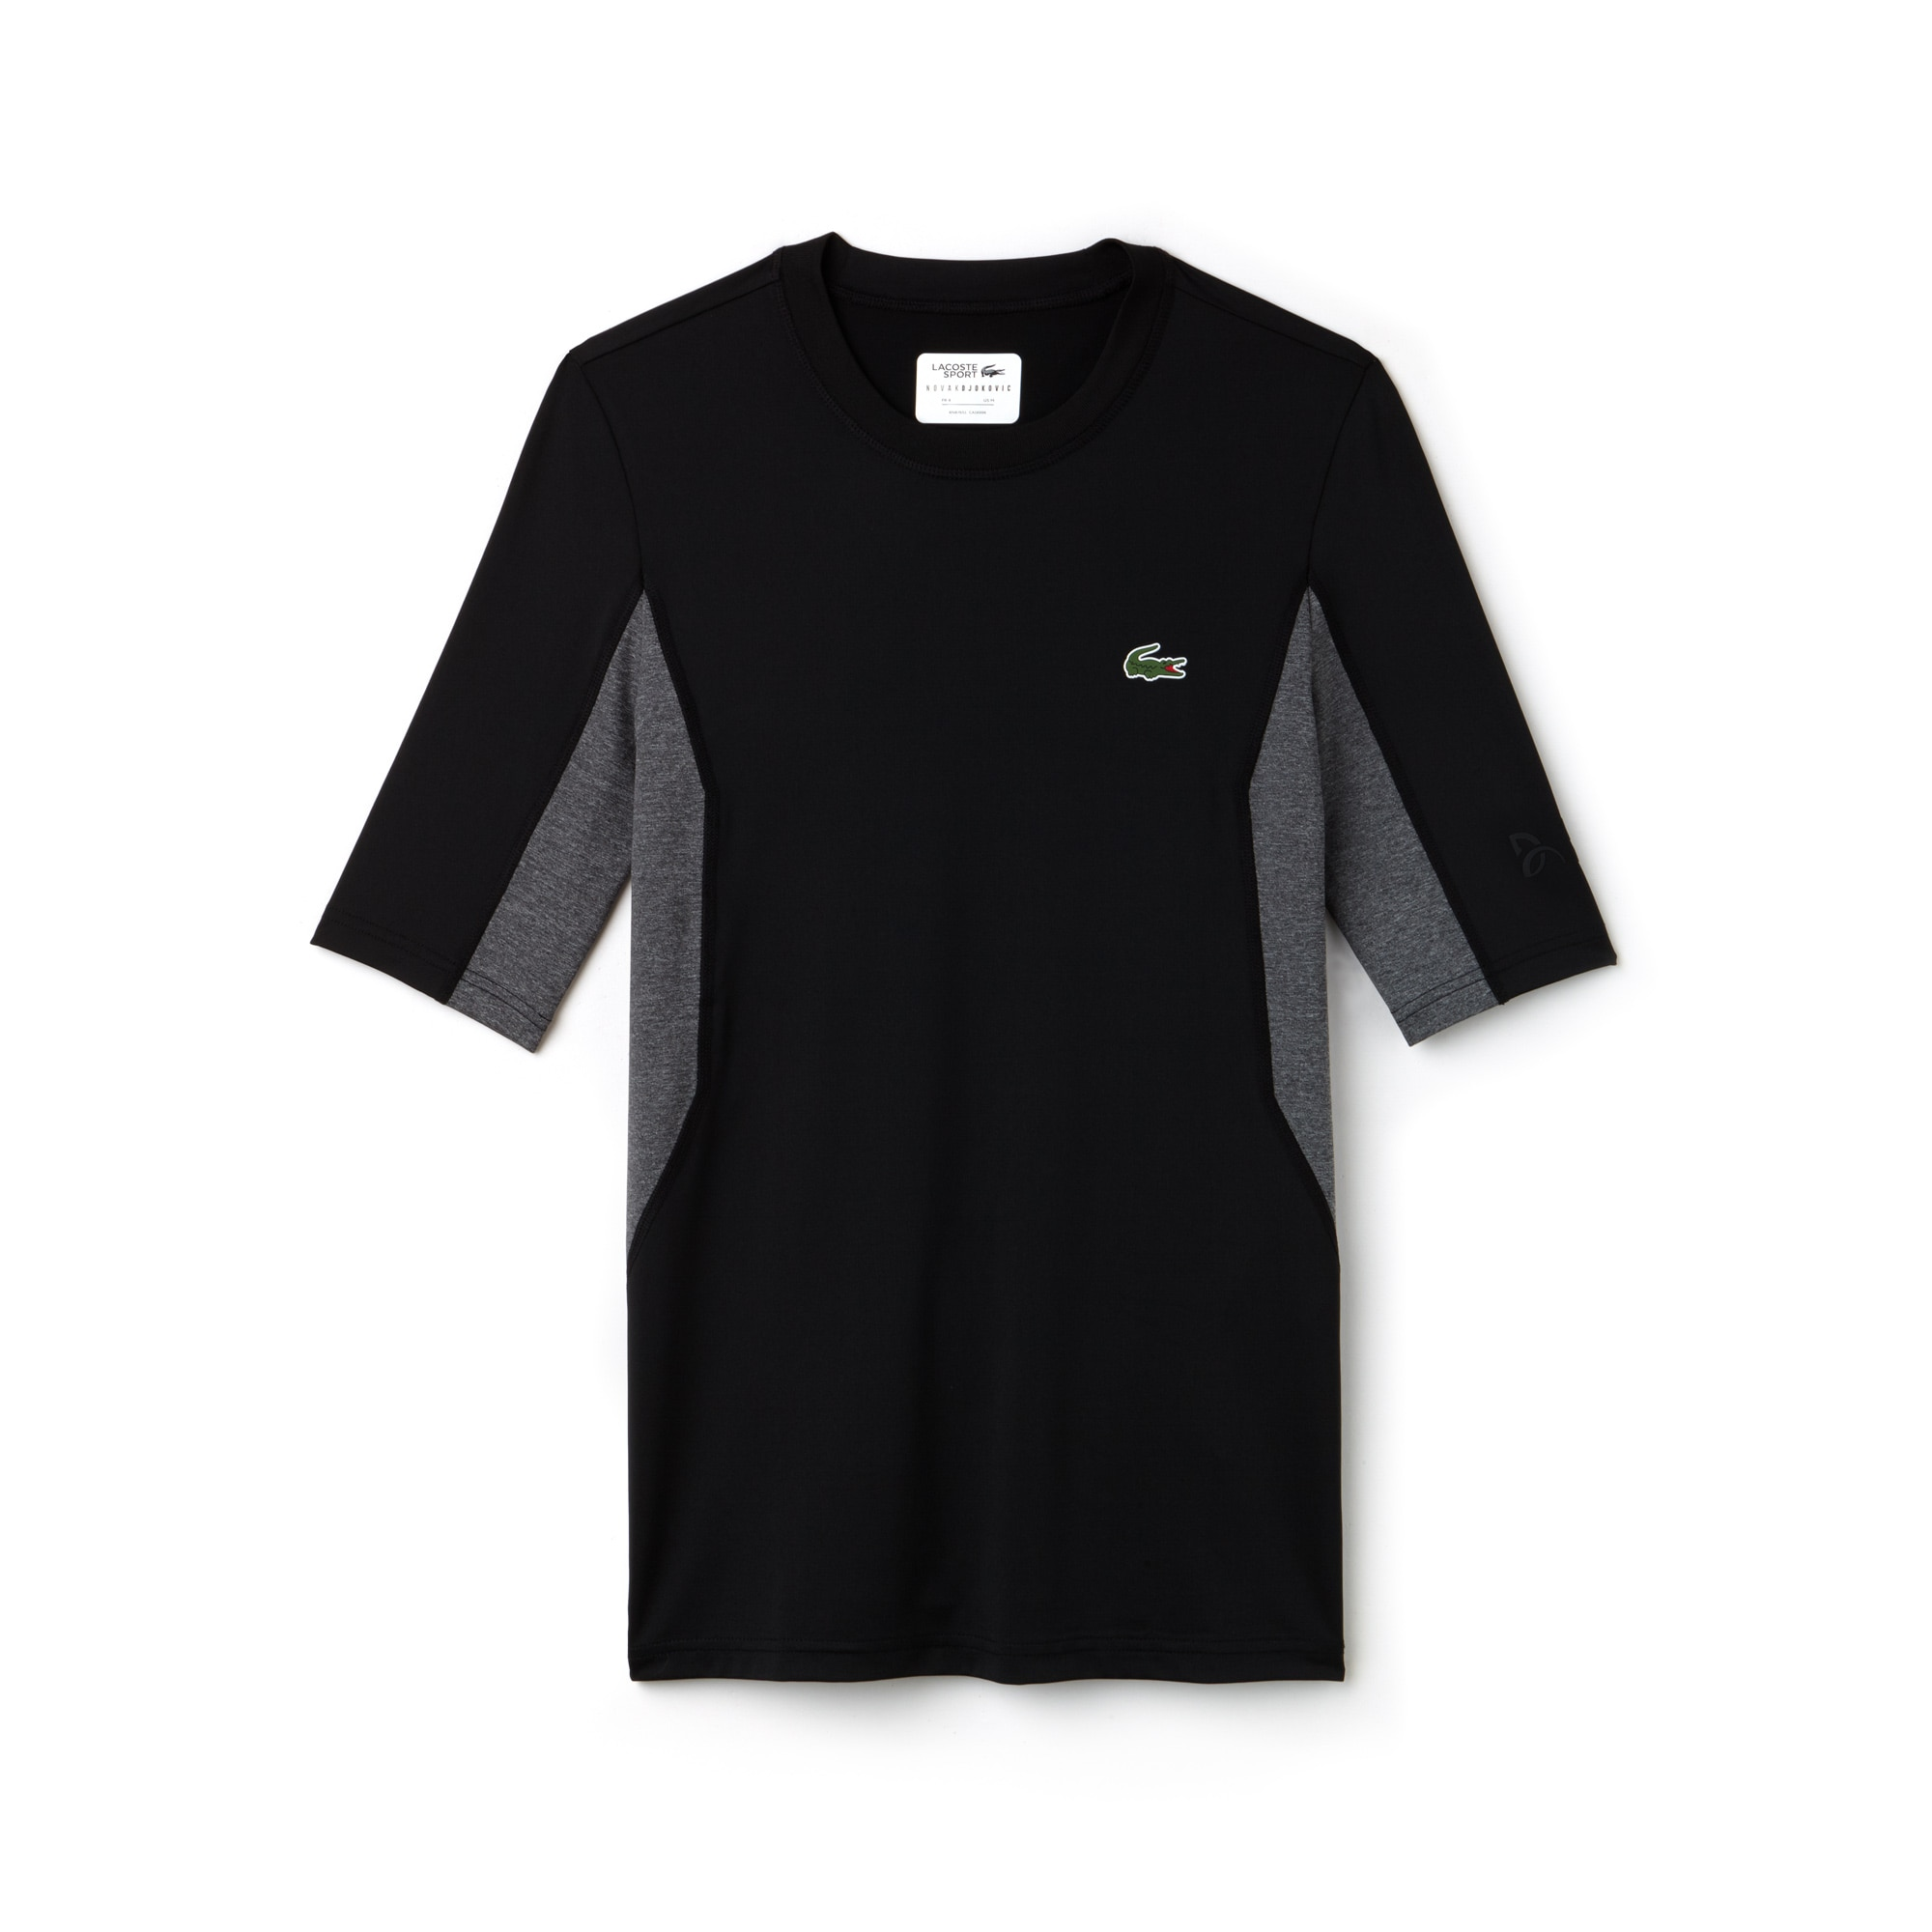 Men's SPORT Crew Neck Stretch Technical Jersey T-shirt -  x Novak Djokovic Off Court Premium Edition